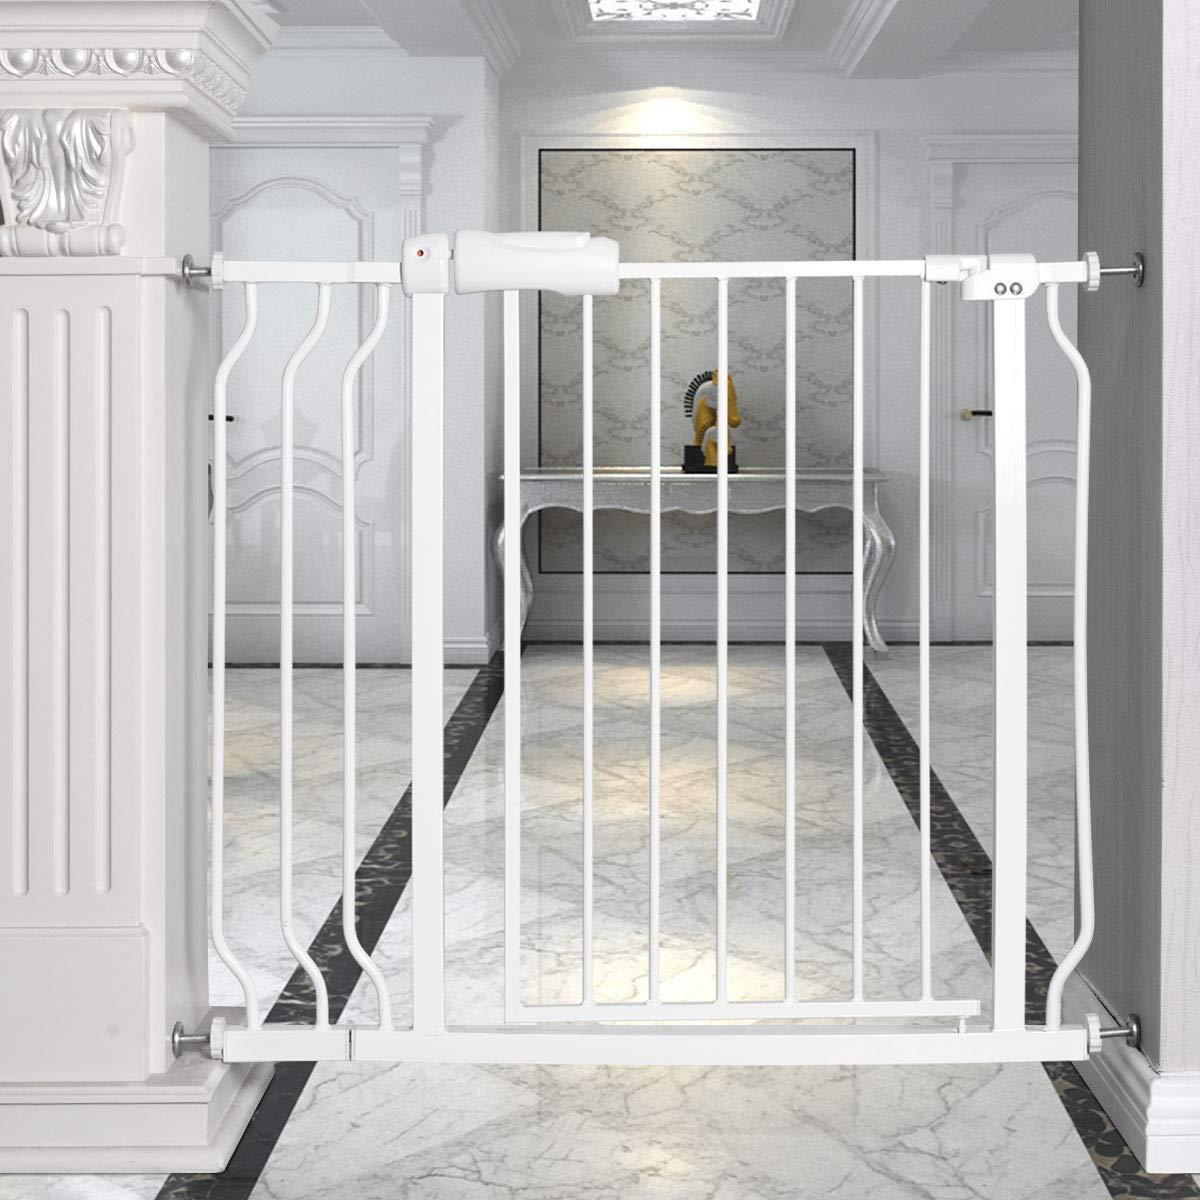 PETSJOY Walk Through Baby Gate Safety Pet Dog Gate for Stairs Door Hallway, Width Adjustable 29-38.5 Inch